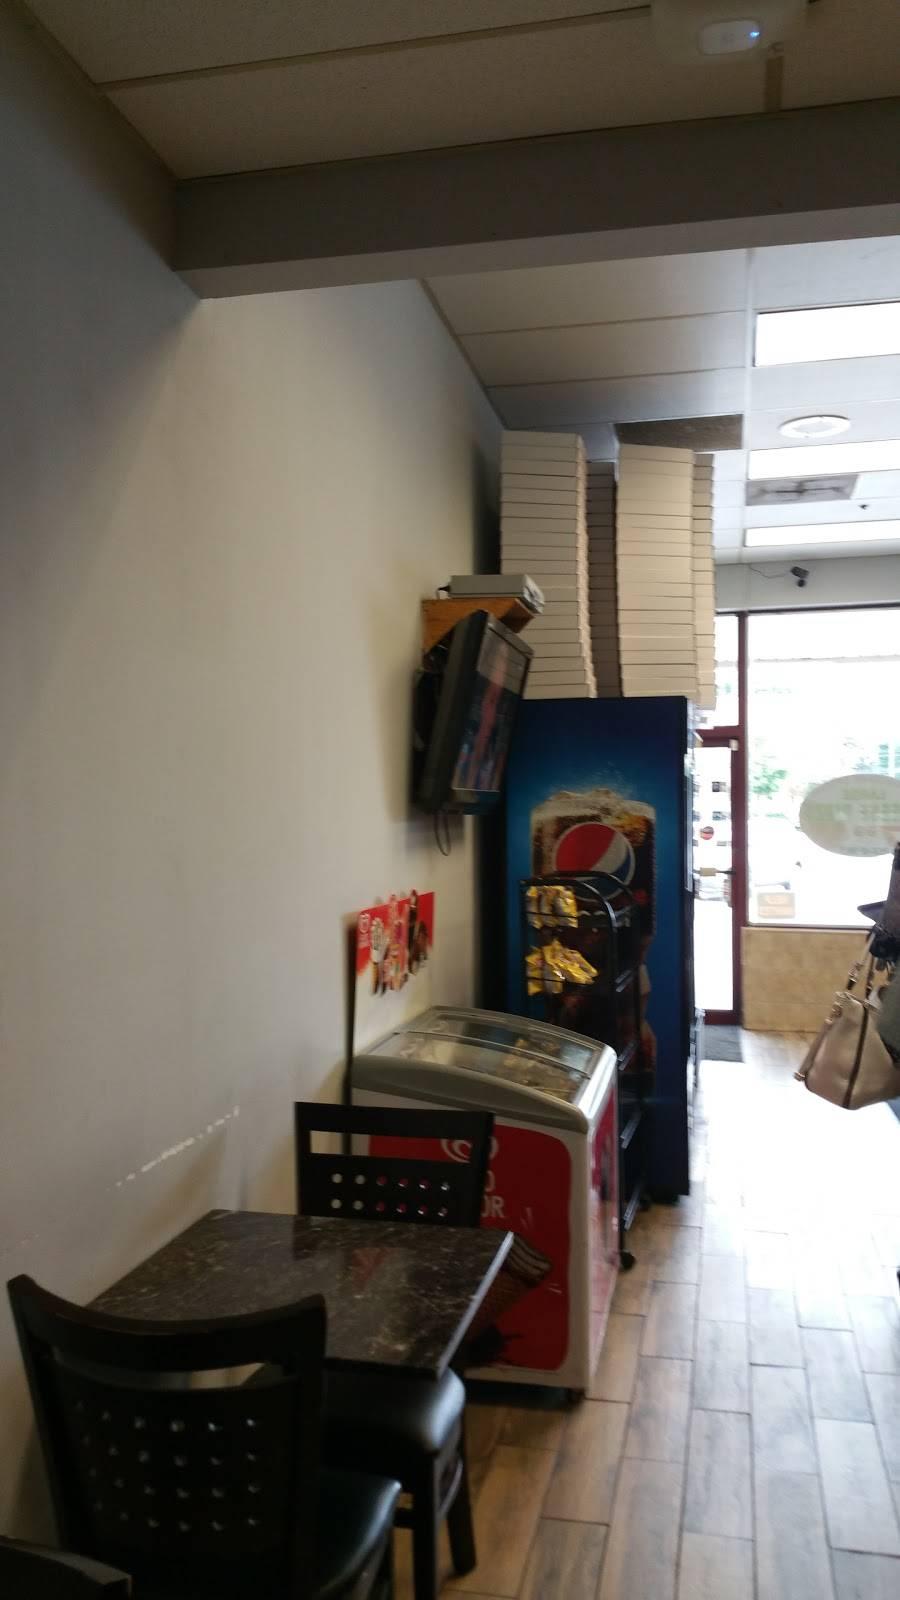 Wize Guys Pizzeria & Restaurant   restaurant   380 W Pleasantview Ave, Hackensack, NJ 07601, USA   2013431000 OR +1 201-343-1000